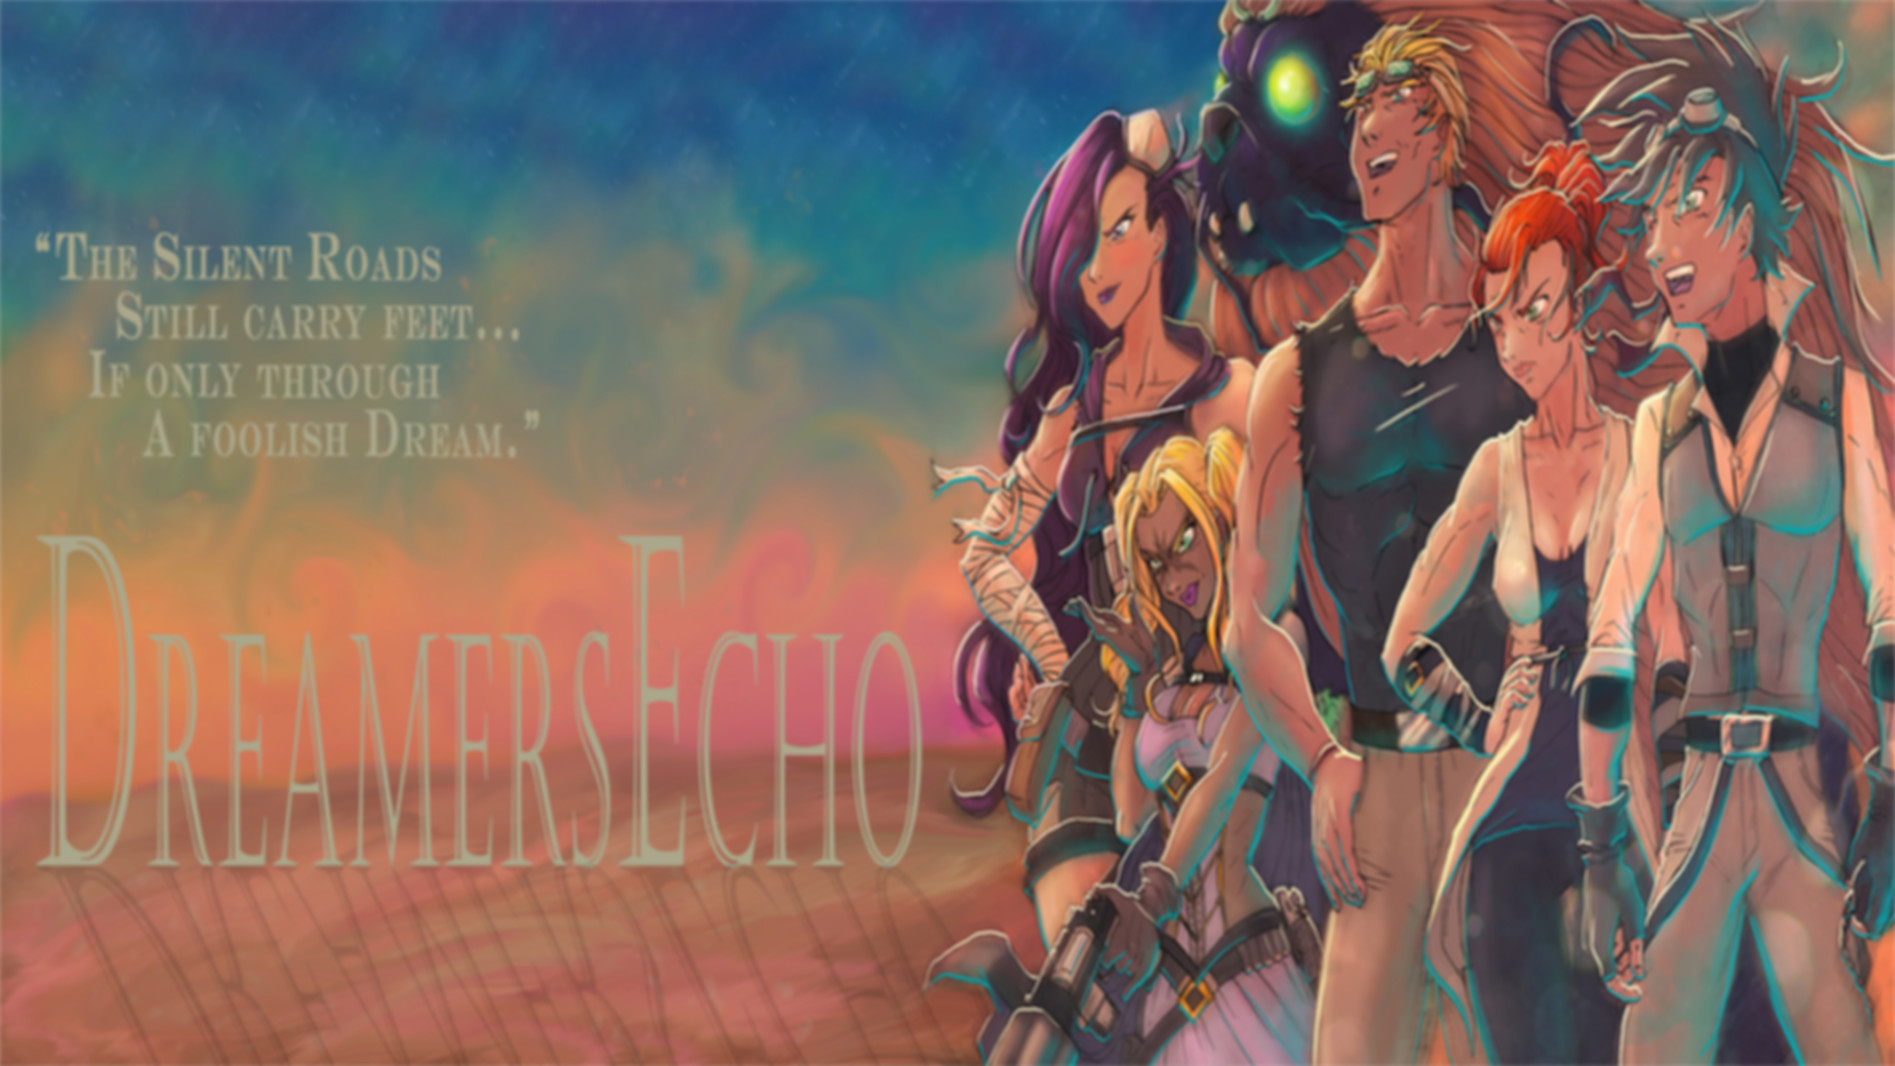 DreamersEcho Volume 2 Banner